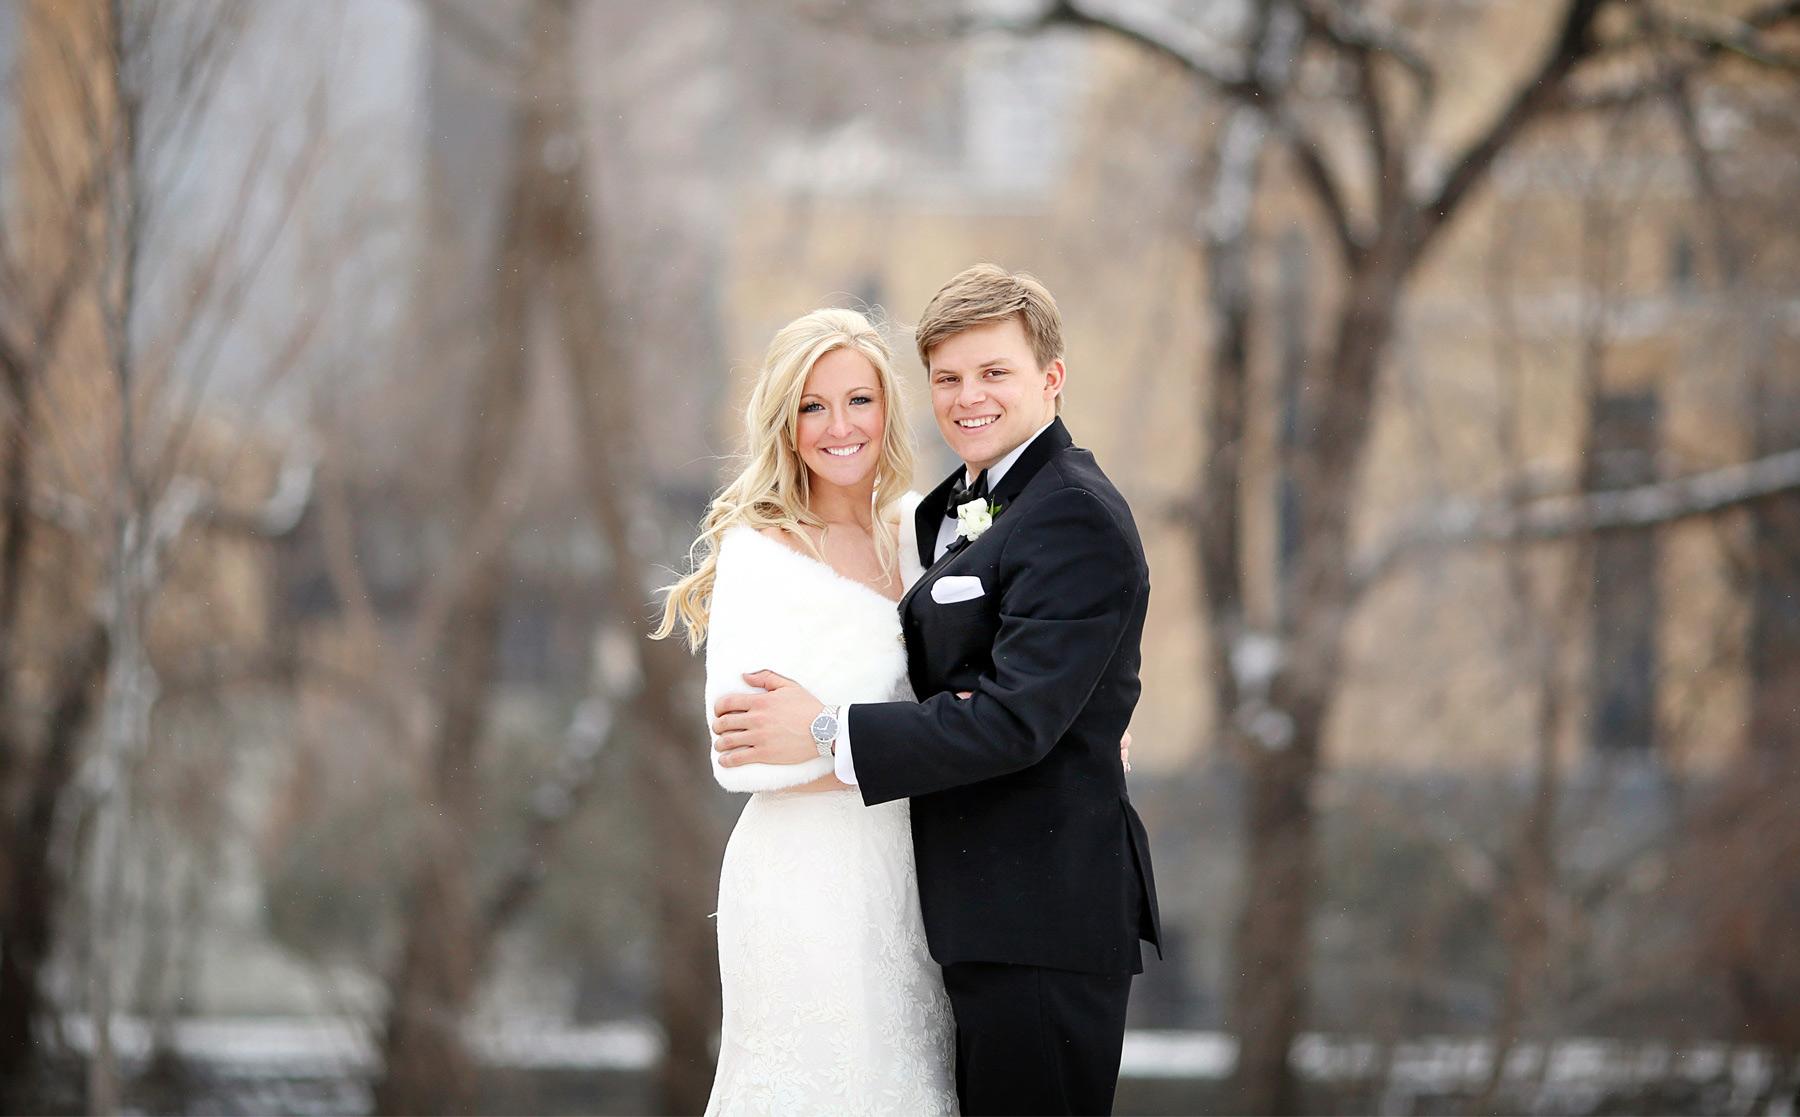 10-Minneapolis-Minnesota-Wedding-Photography-by-Vick-Photography-Downtown-Winter-Caroline-and-J.jpg